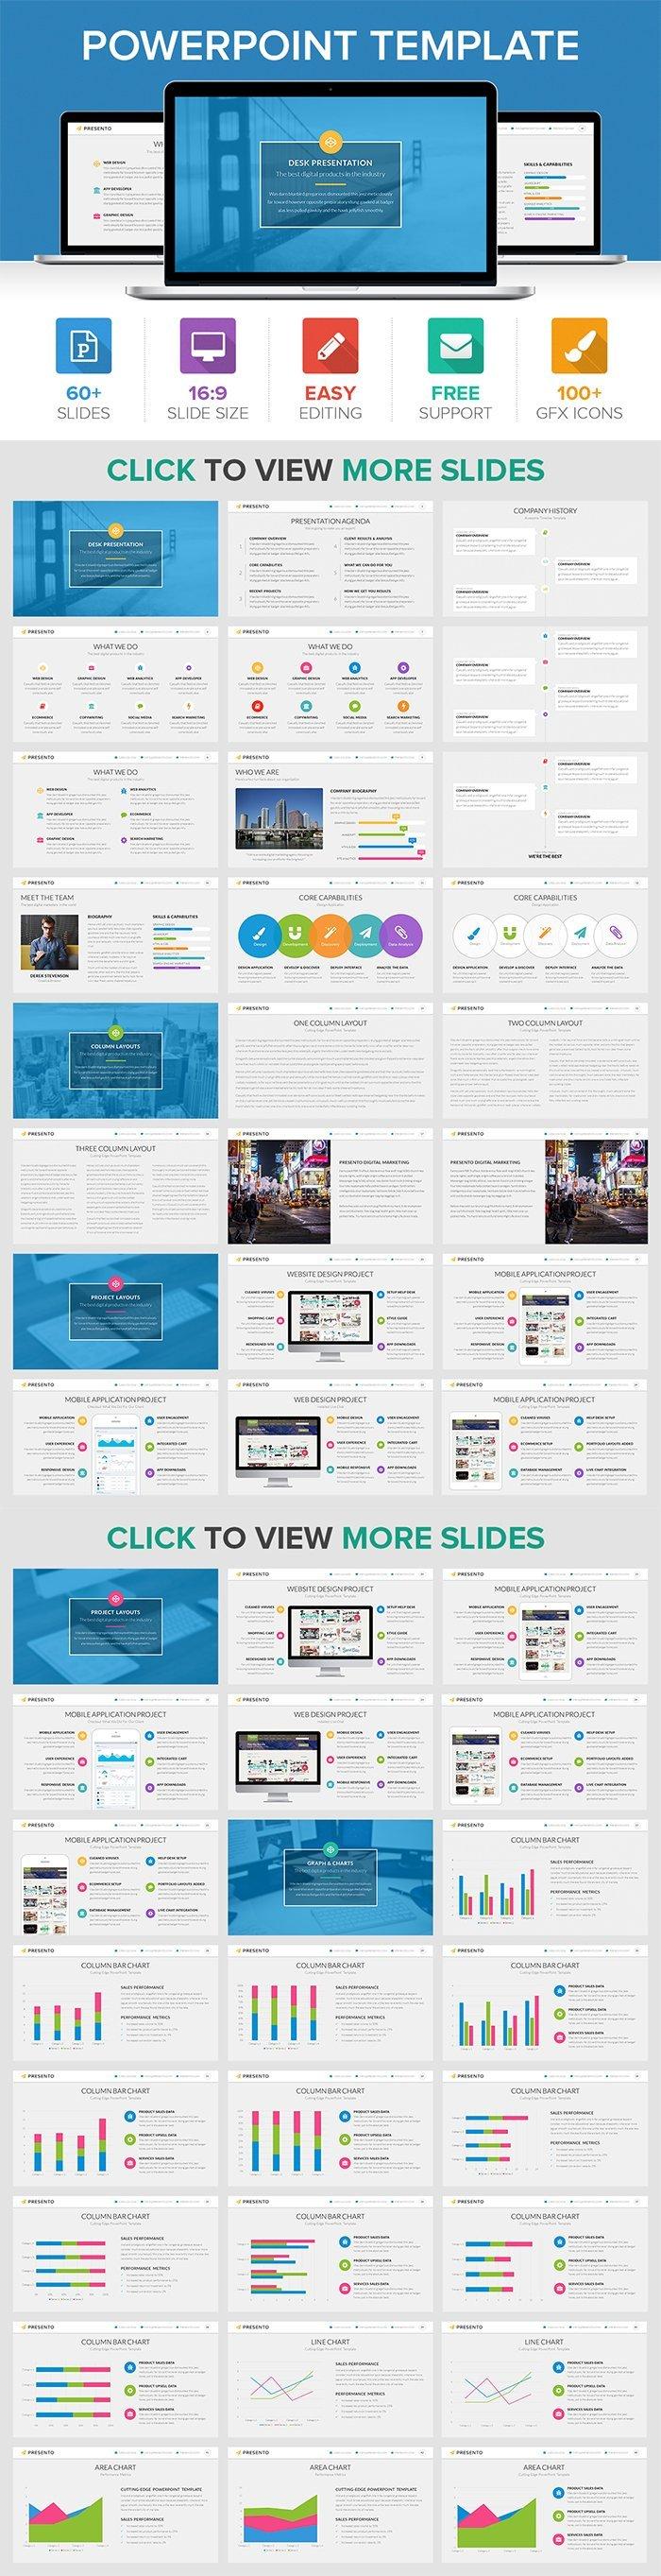 Get 5 best powerpoint templates for only 15 inkydeals datalytics powerpoint presentation toneelgroepblik Images